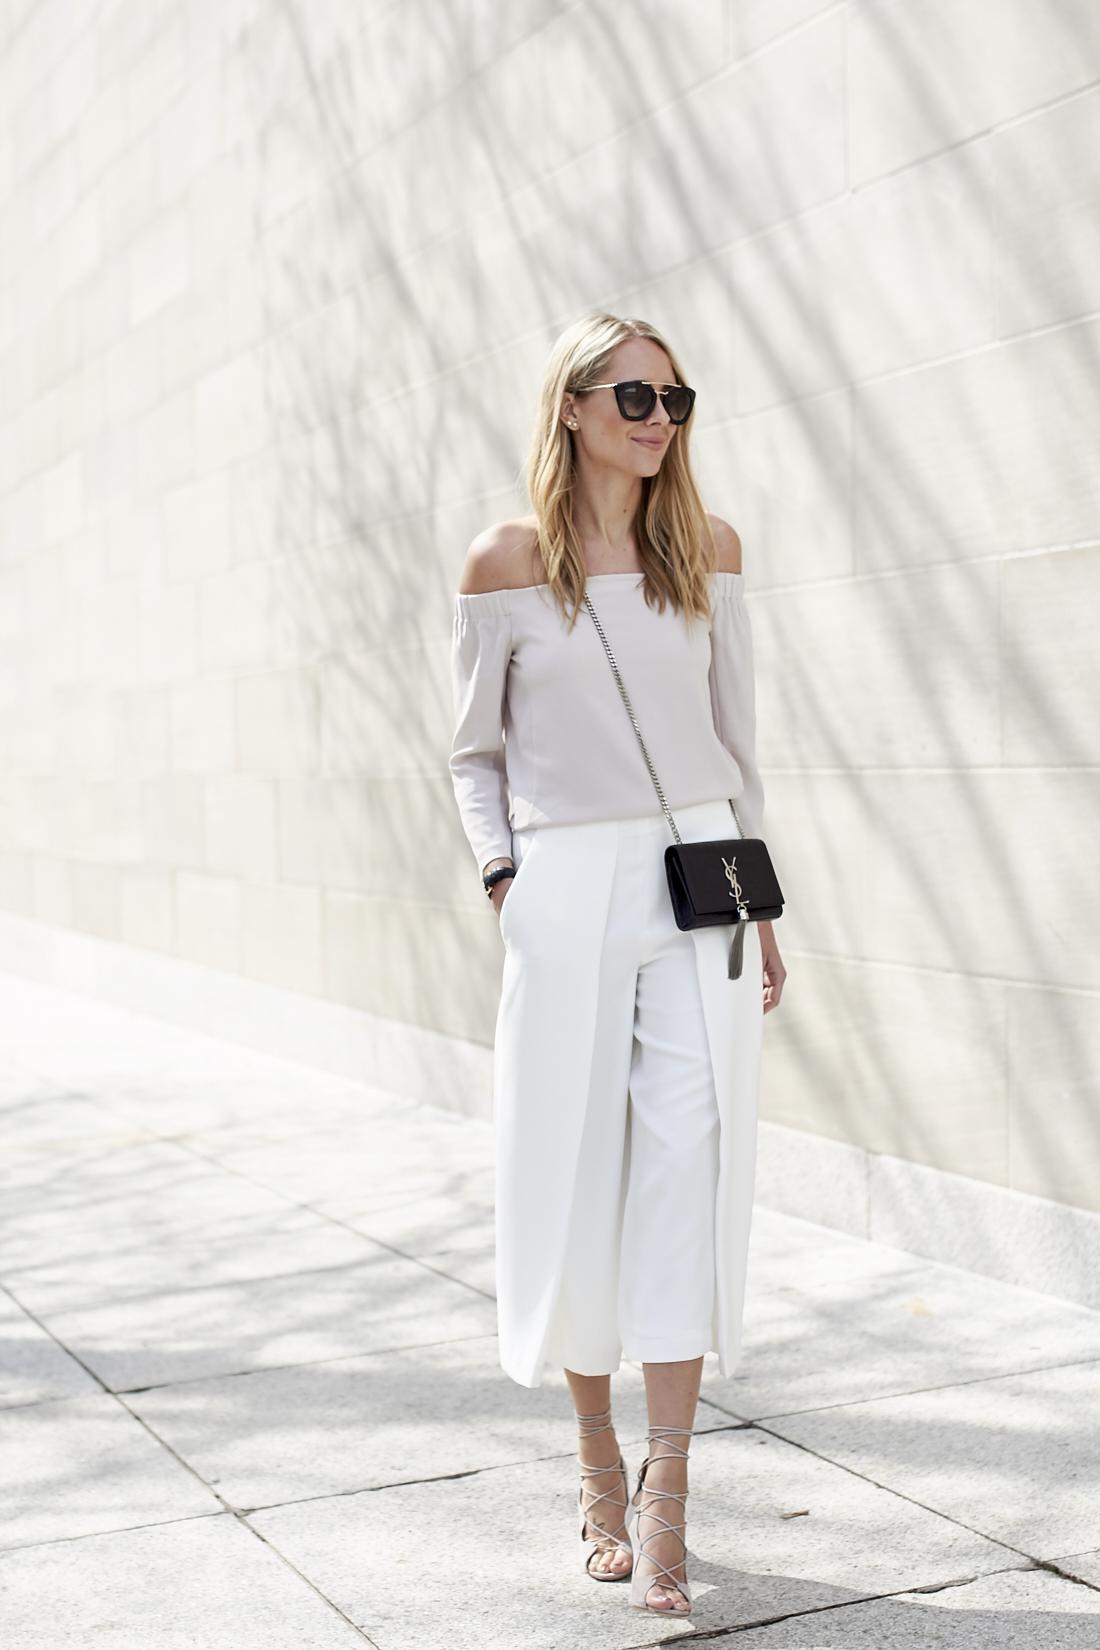 fashion-jackson-white-culottes-mgemi-marea-lace-up-heels-off-the-shoulder-top-prada-retro-sunglasses-saint-laurent-monogram-crossbody